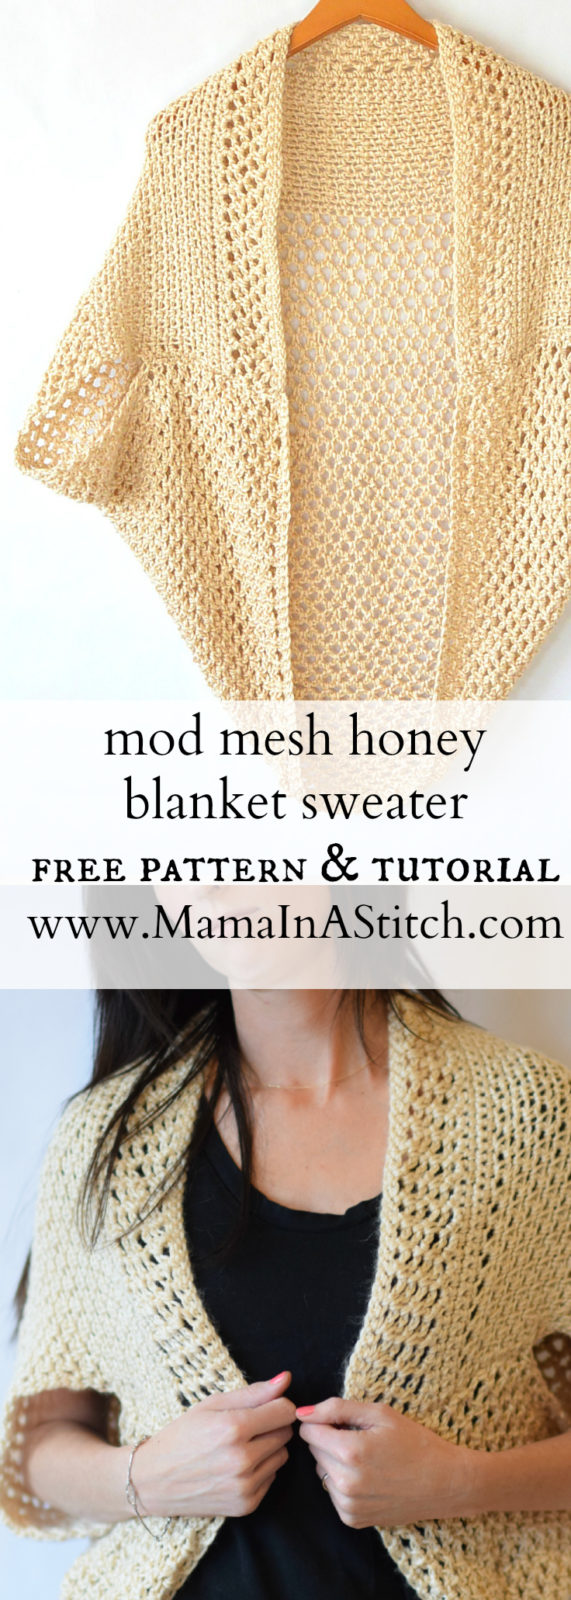 Mod Mesh Honey Blanket Sweater – Mama In A Stitch